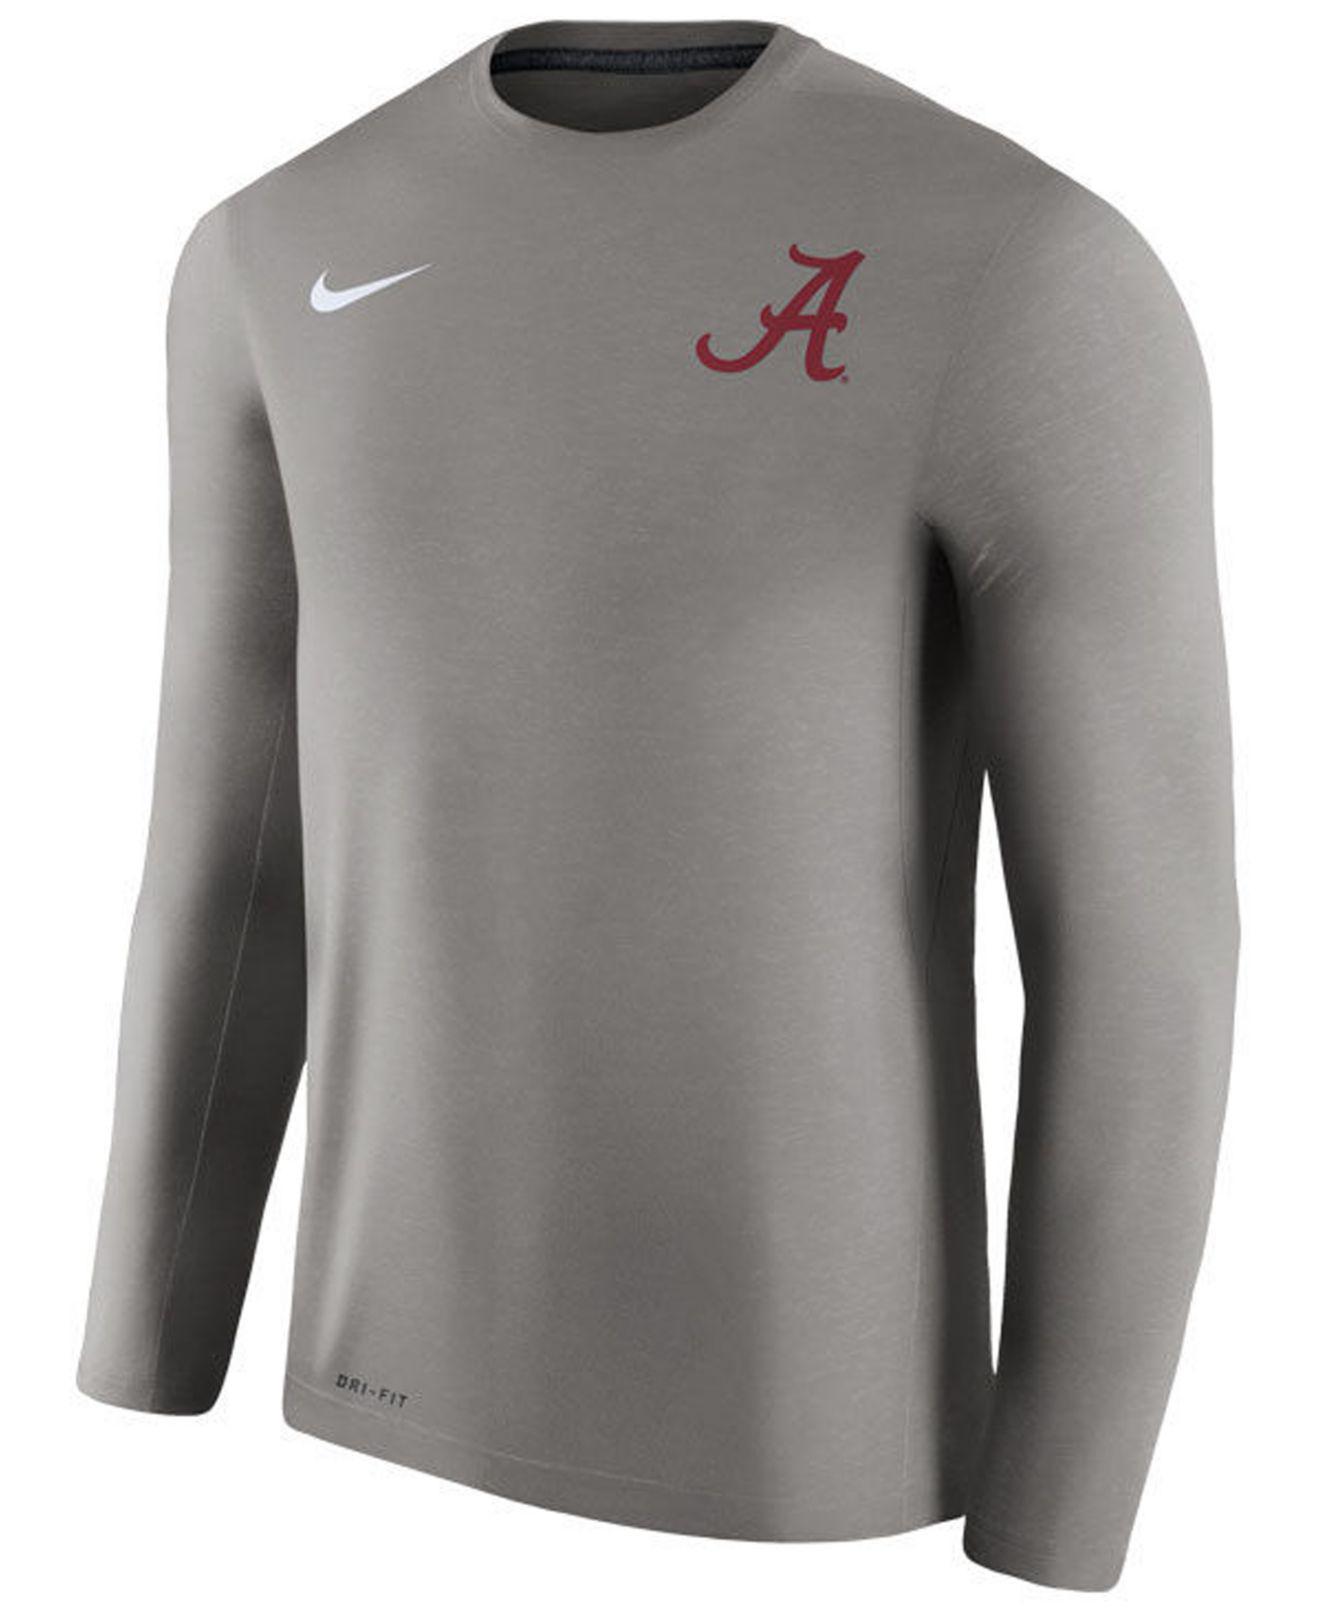 e9fc3317 Lyst - Nike Men's Dri-fit Touch Longsleeve T-shirt in Gray for Men